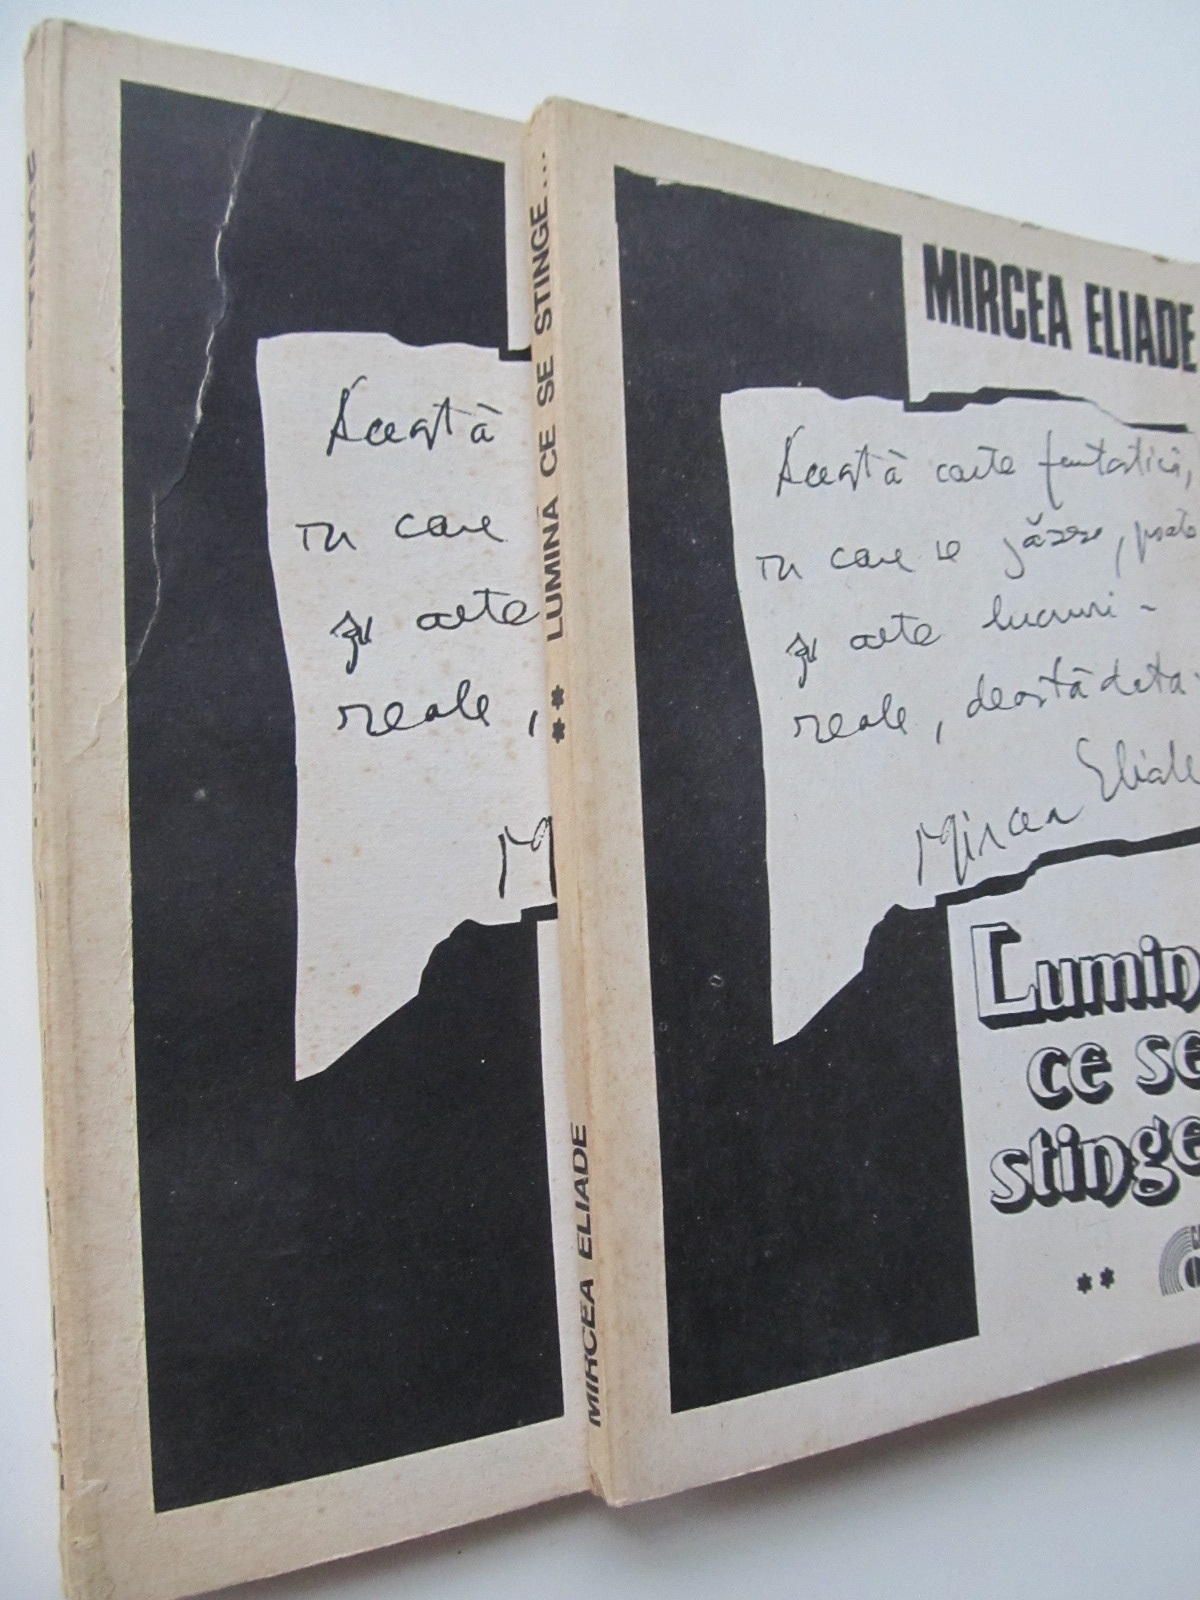 Lumina ce se stinge (2 vol.) - Mircea Eliade | Detalii carte